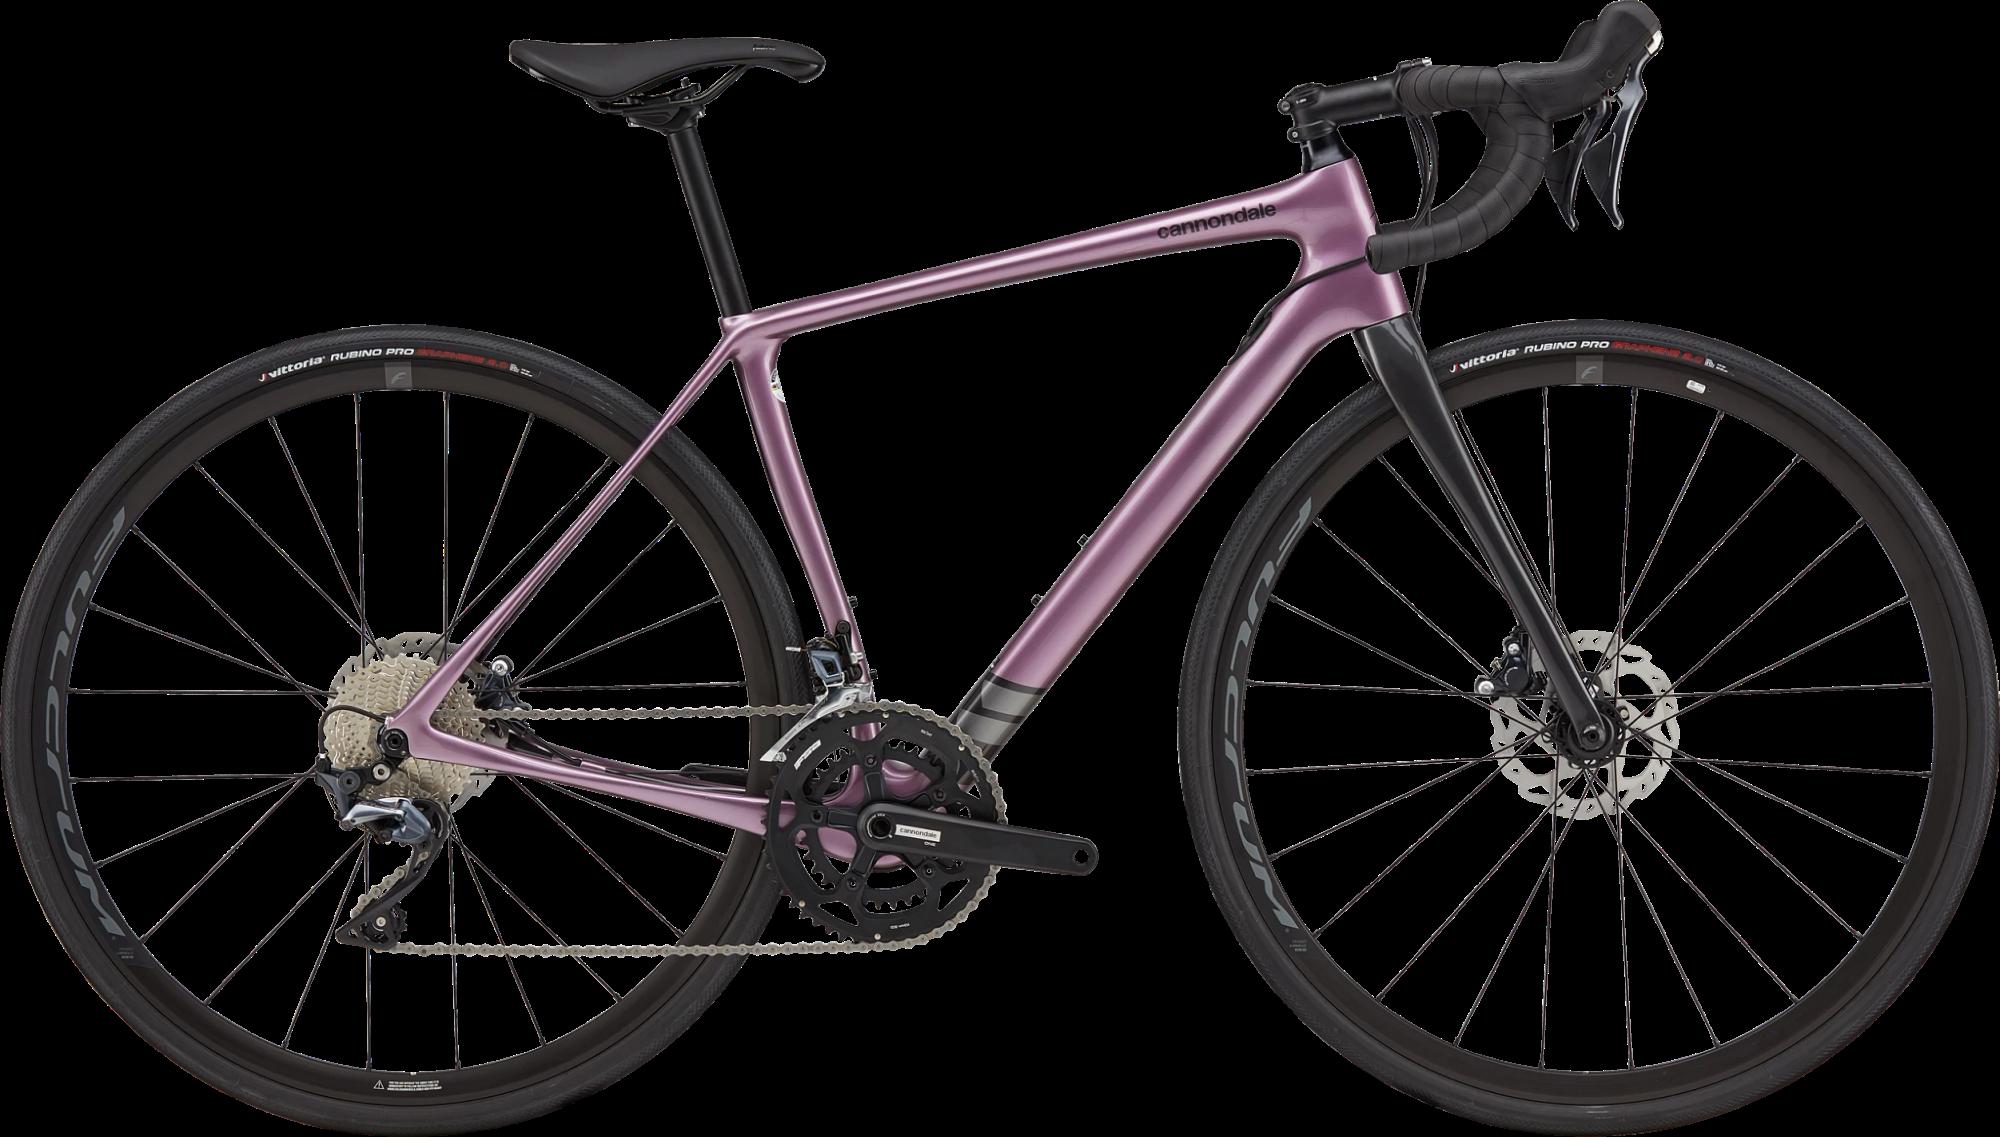 Cannondale Synapse Ultegra Disc Womens Carbon Road Bike 2021 Lavender